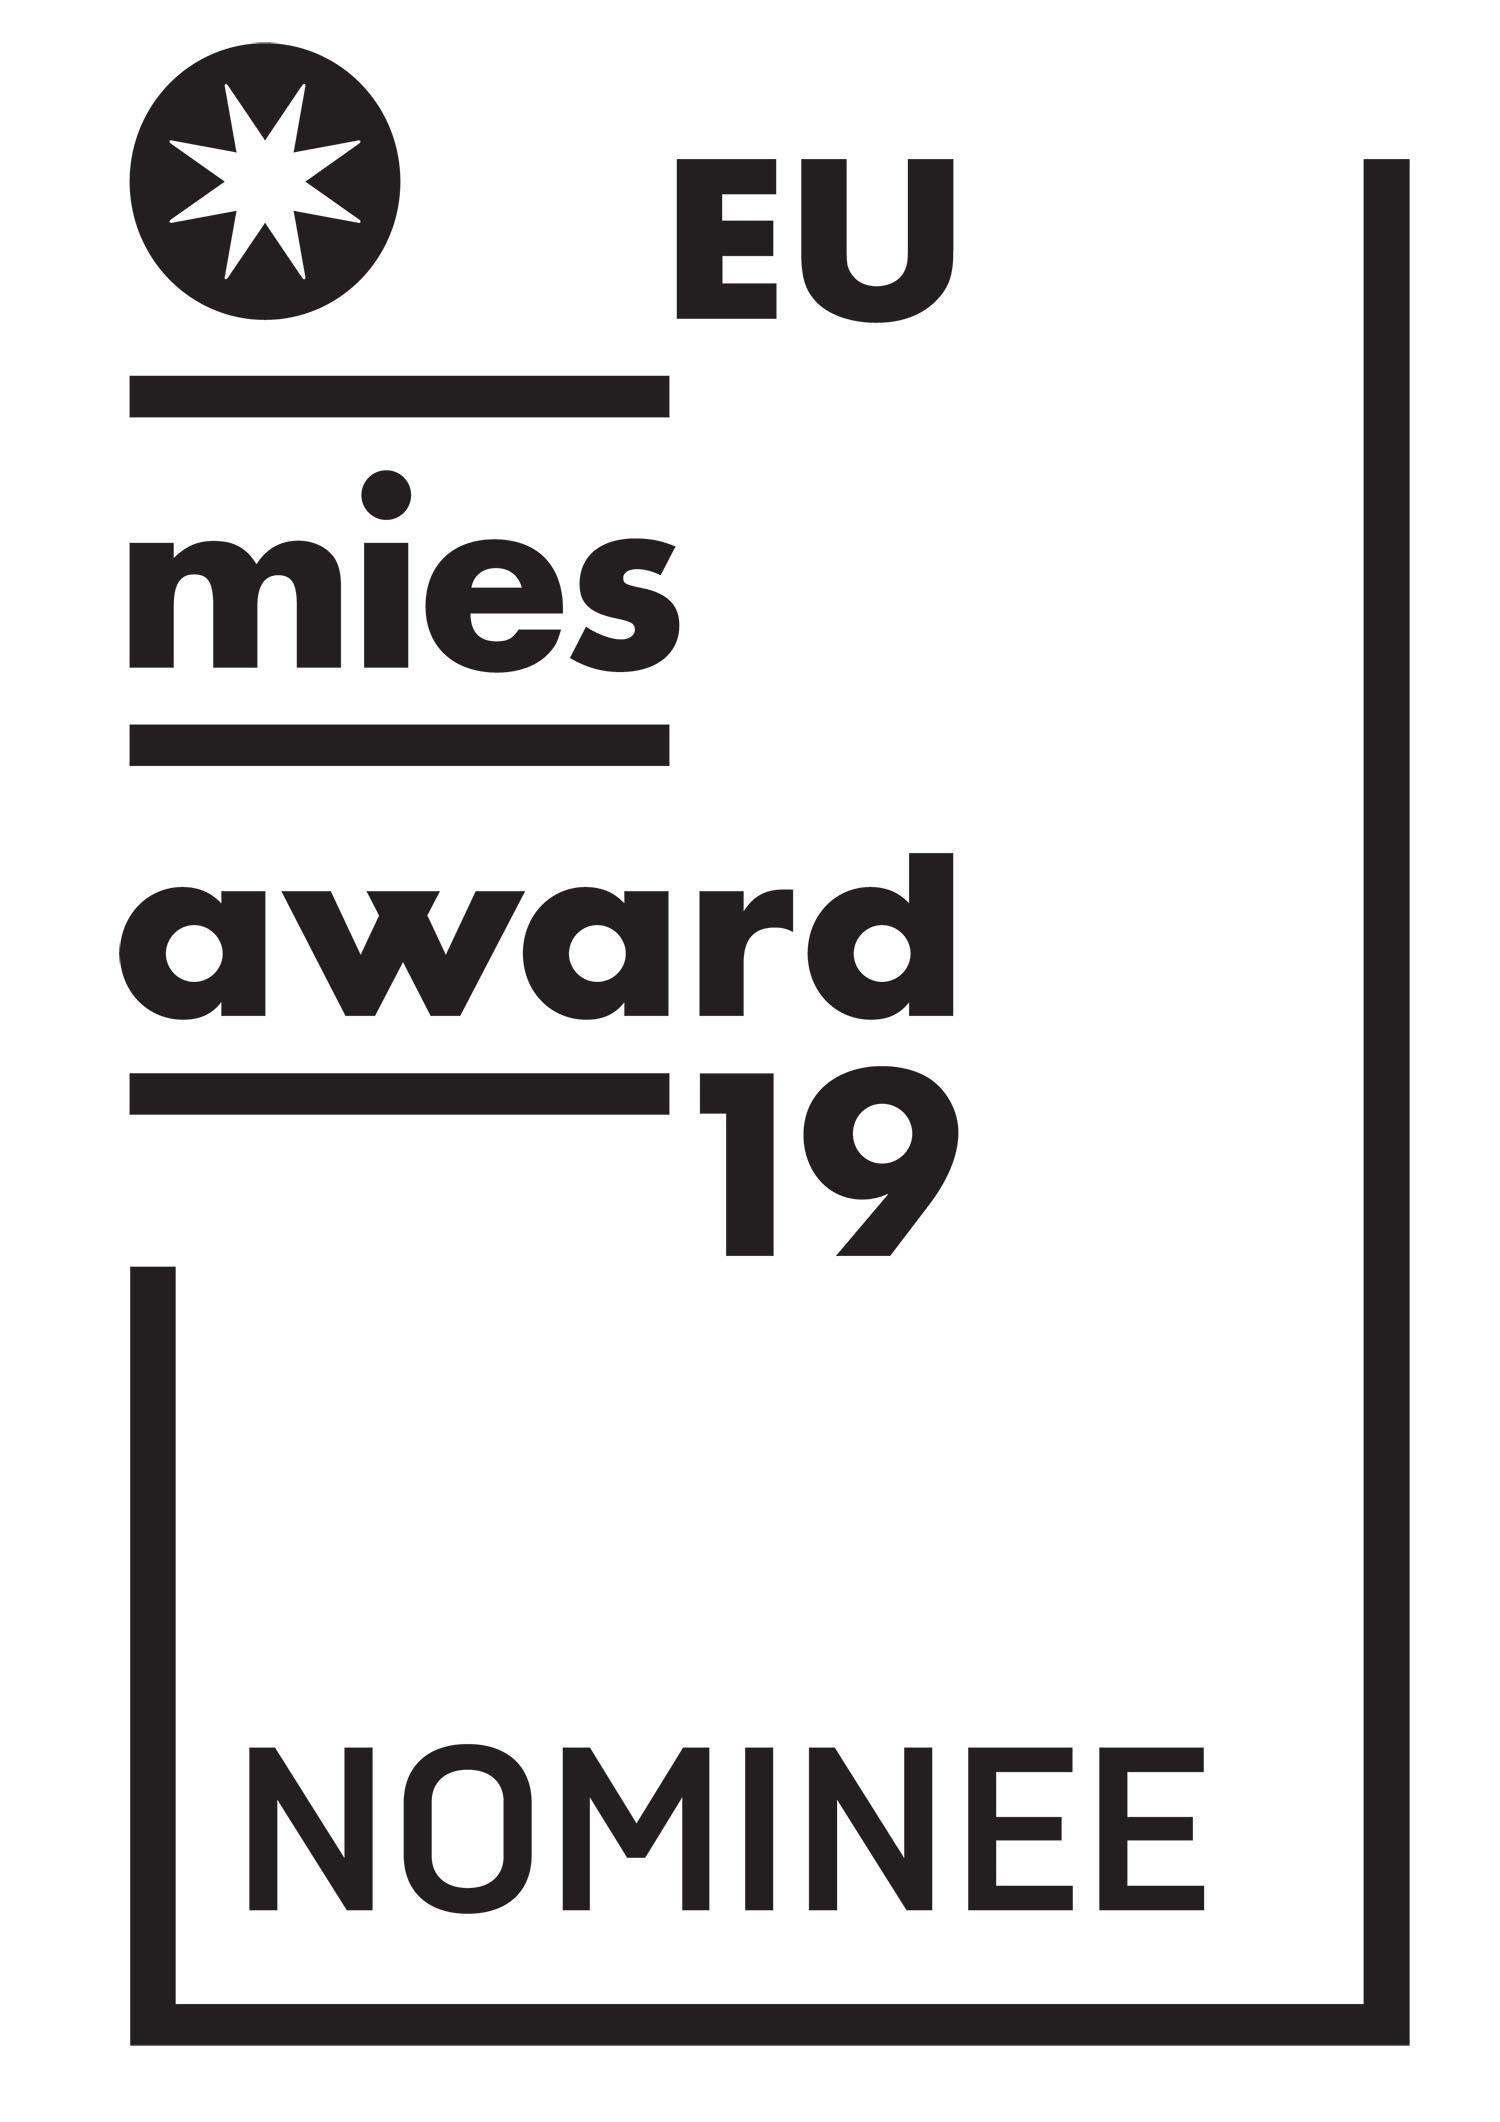 eumiesaward-nominee-2019.jpg